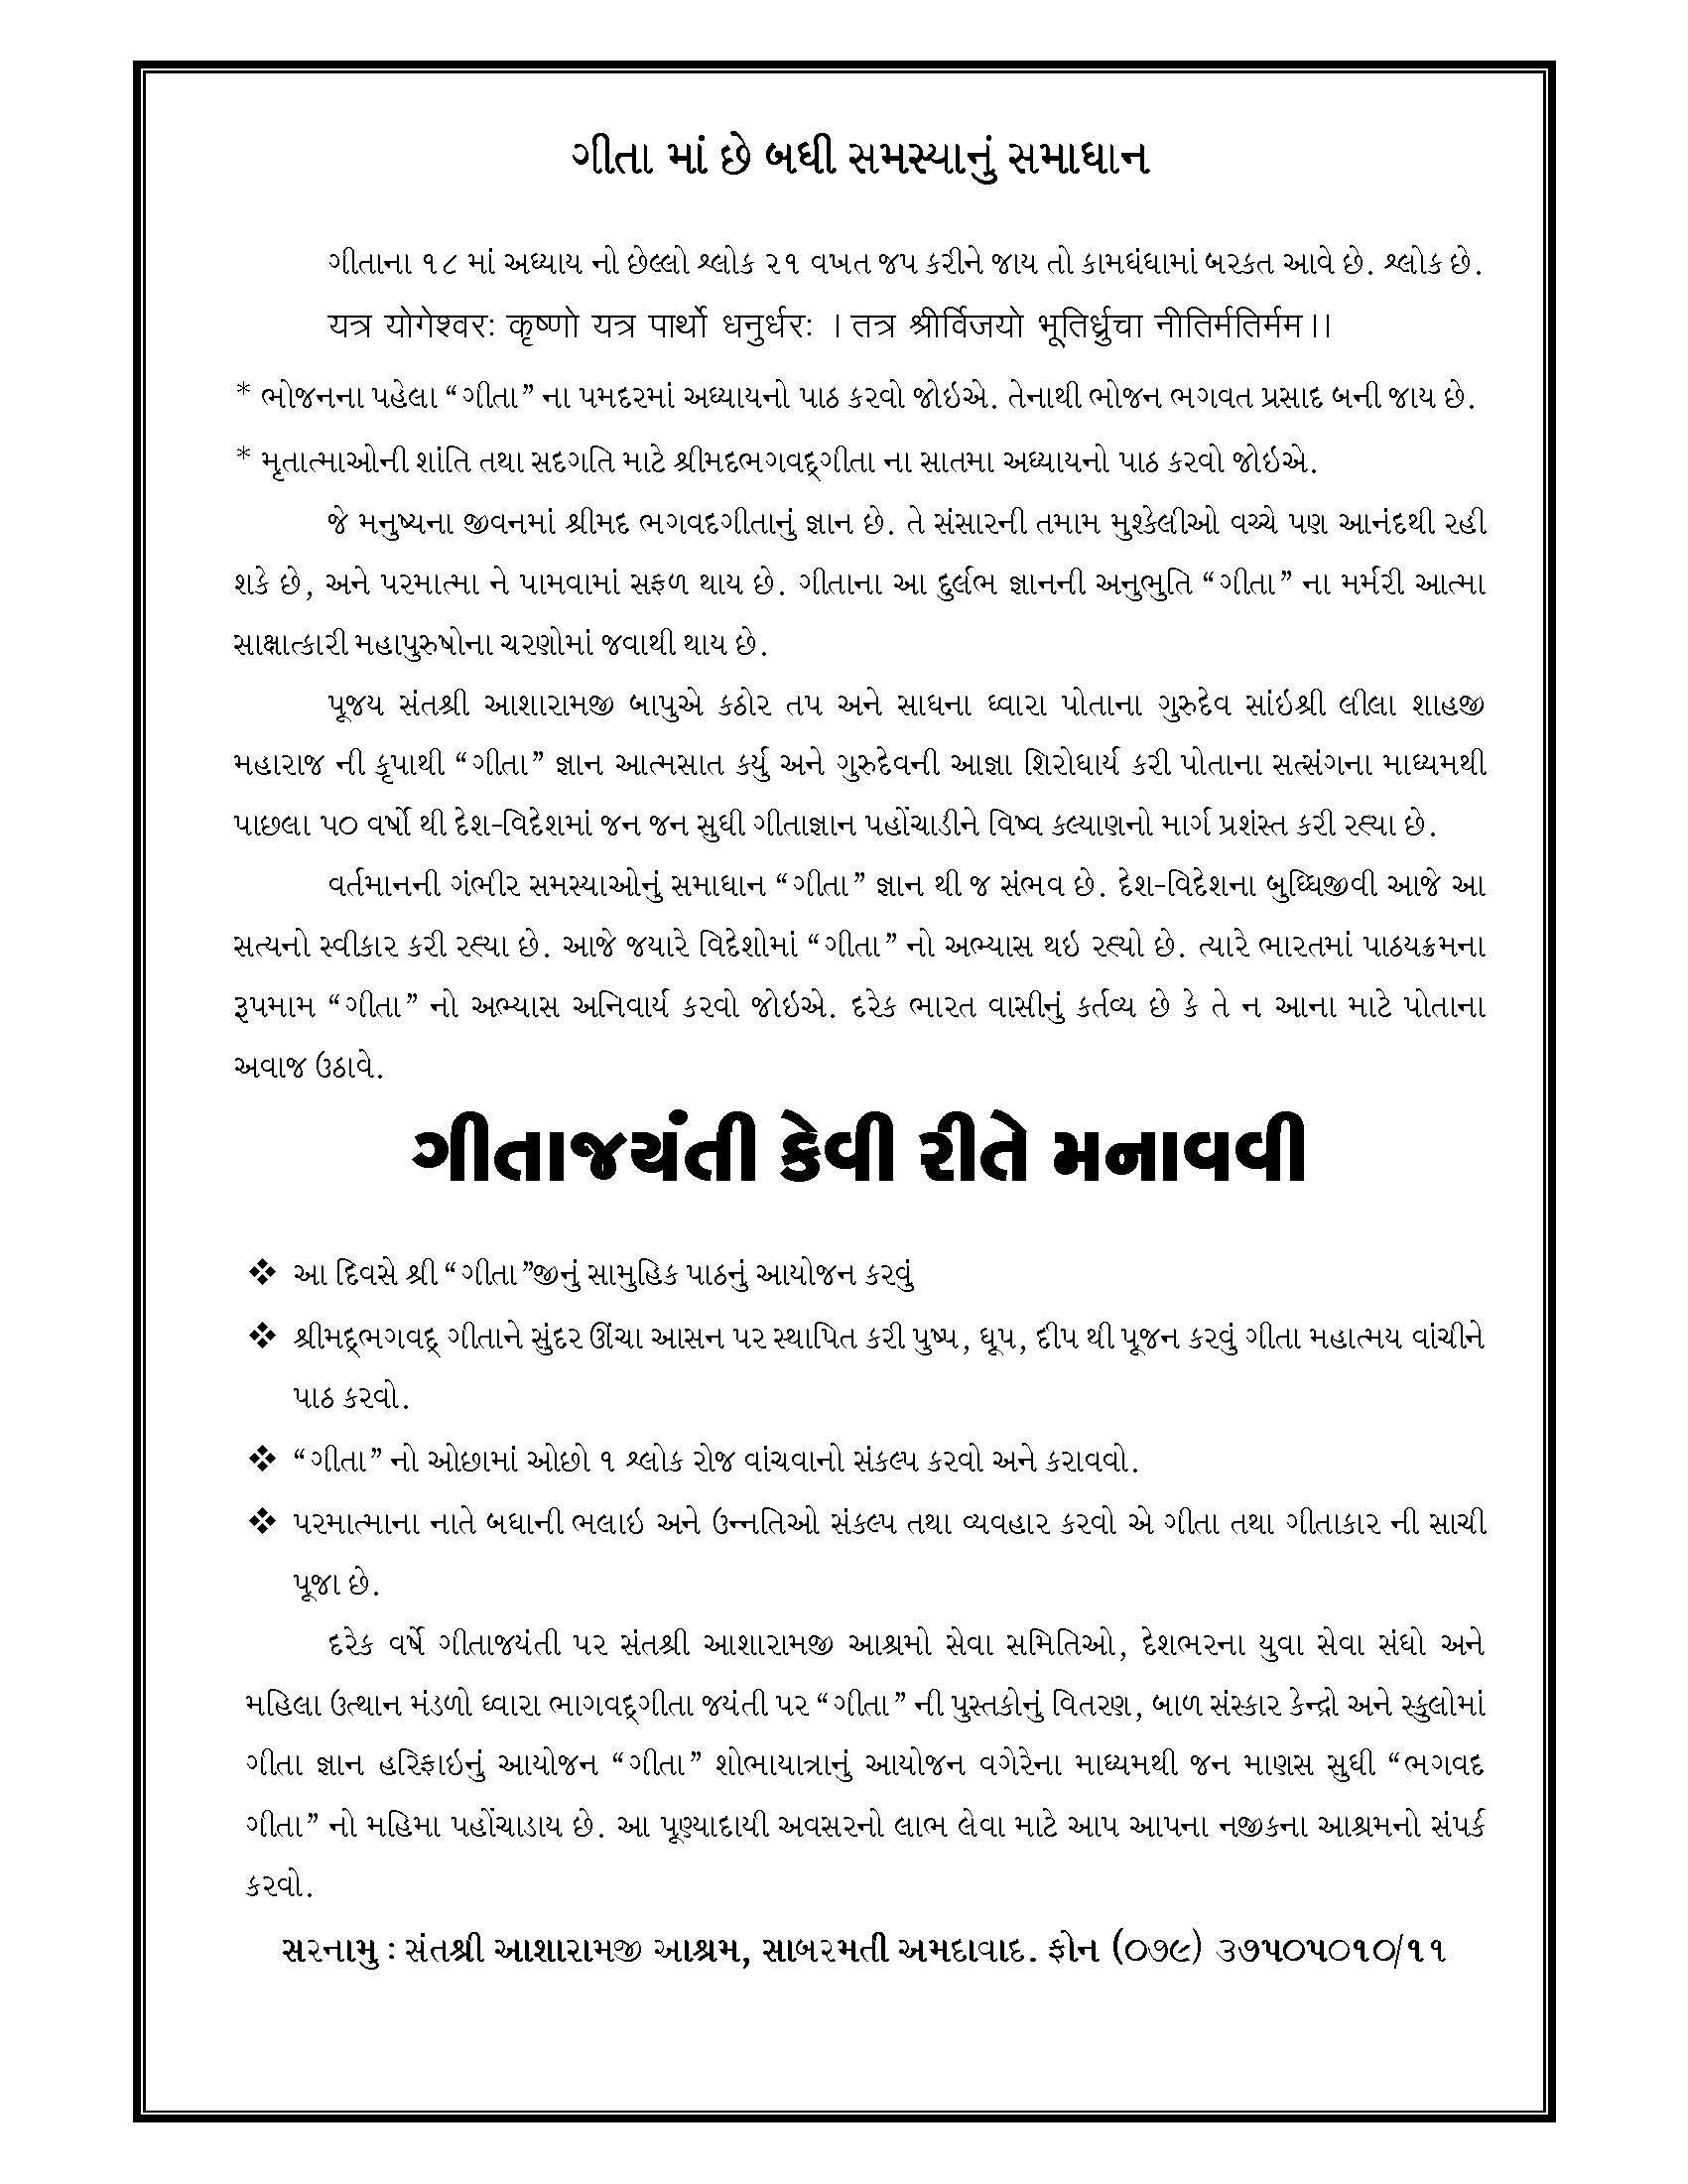 Bhagvad Gita Gujarati Pamplate_Page_2 | Om Guru Om | Diagram, Word - Printable Gujarati Crossword Puzzles